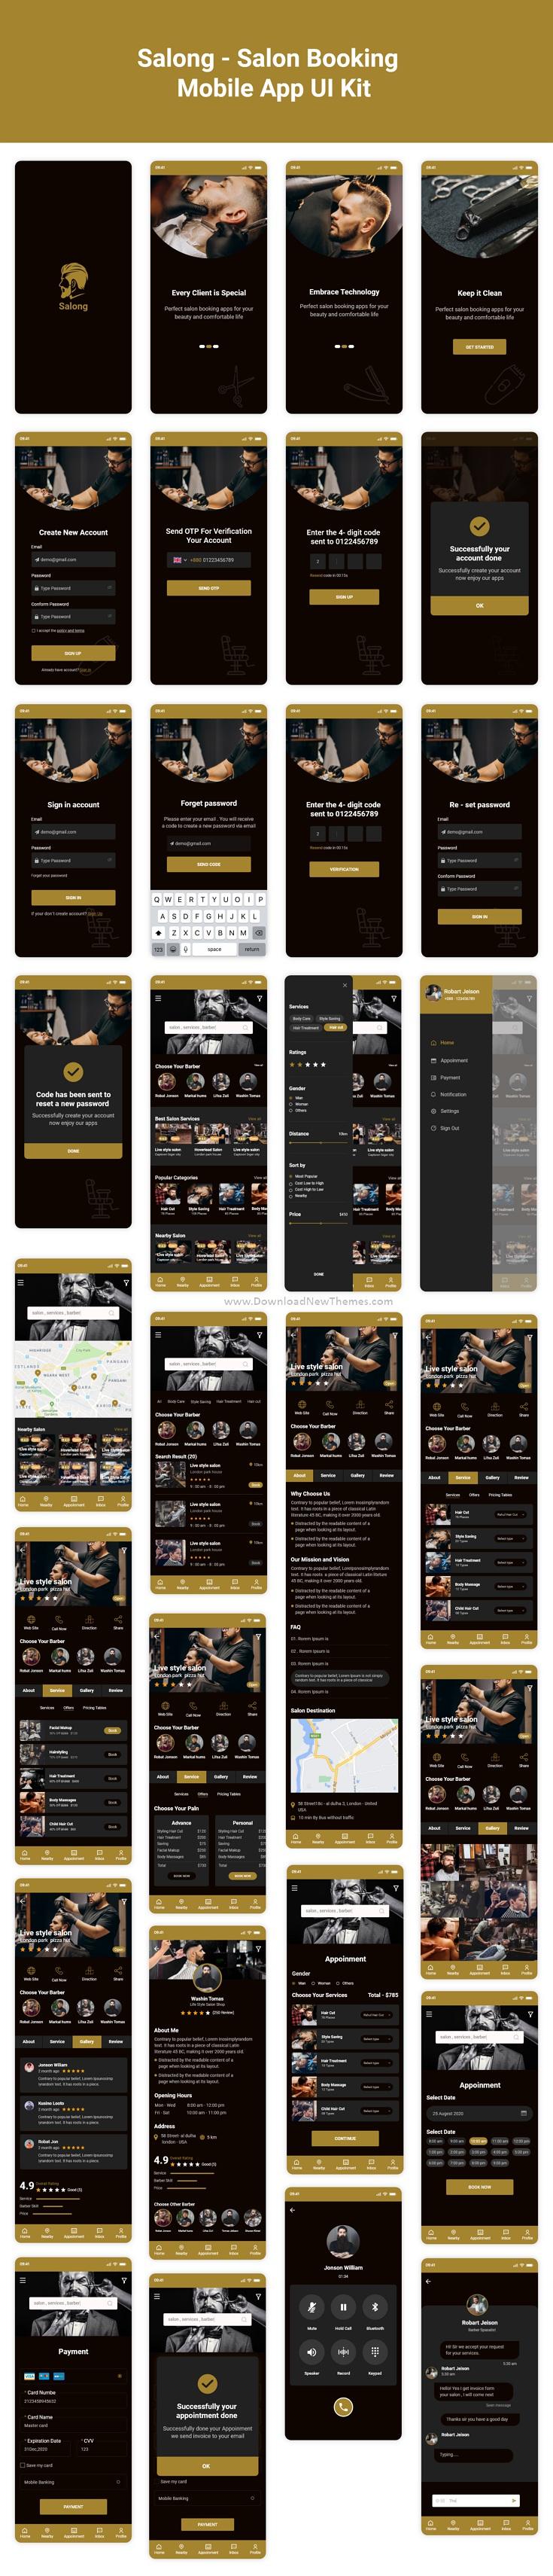 Salon Booking Mobile App UI Kit